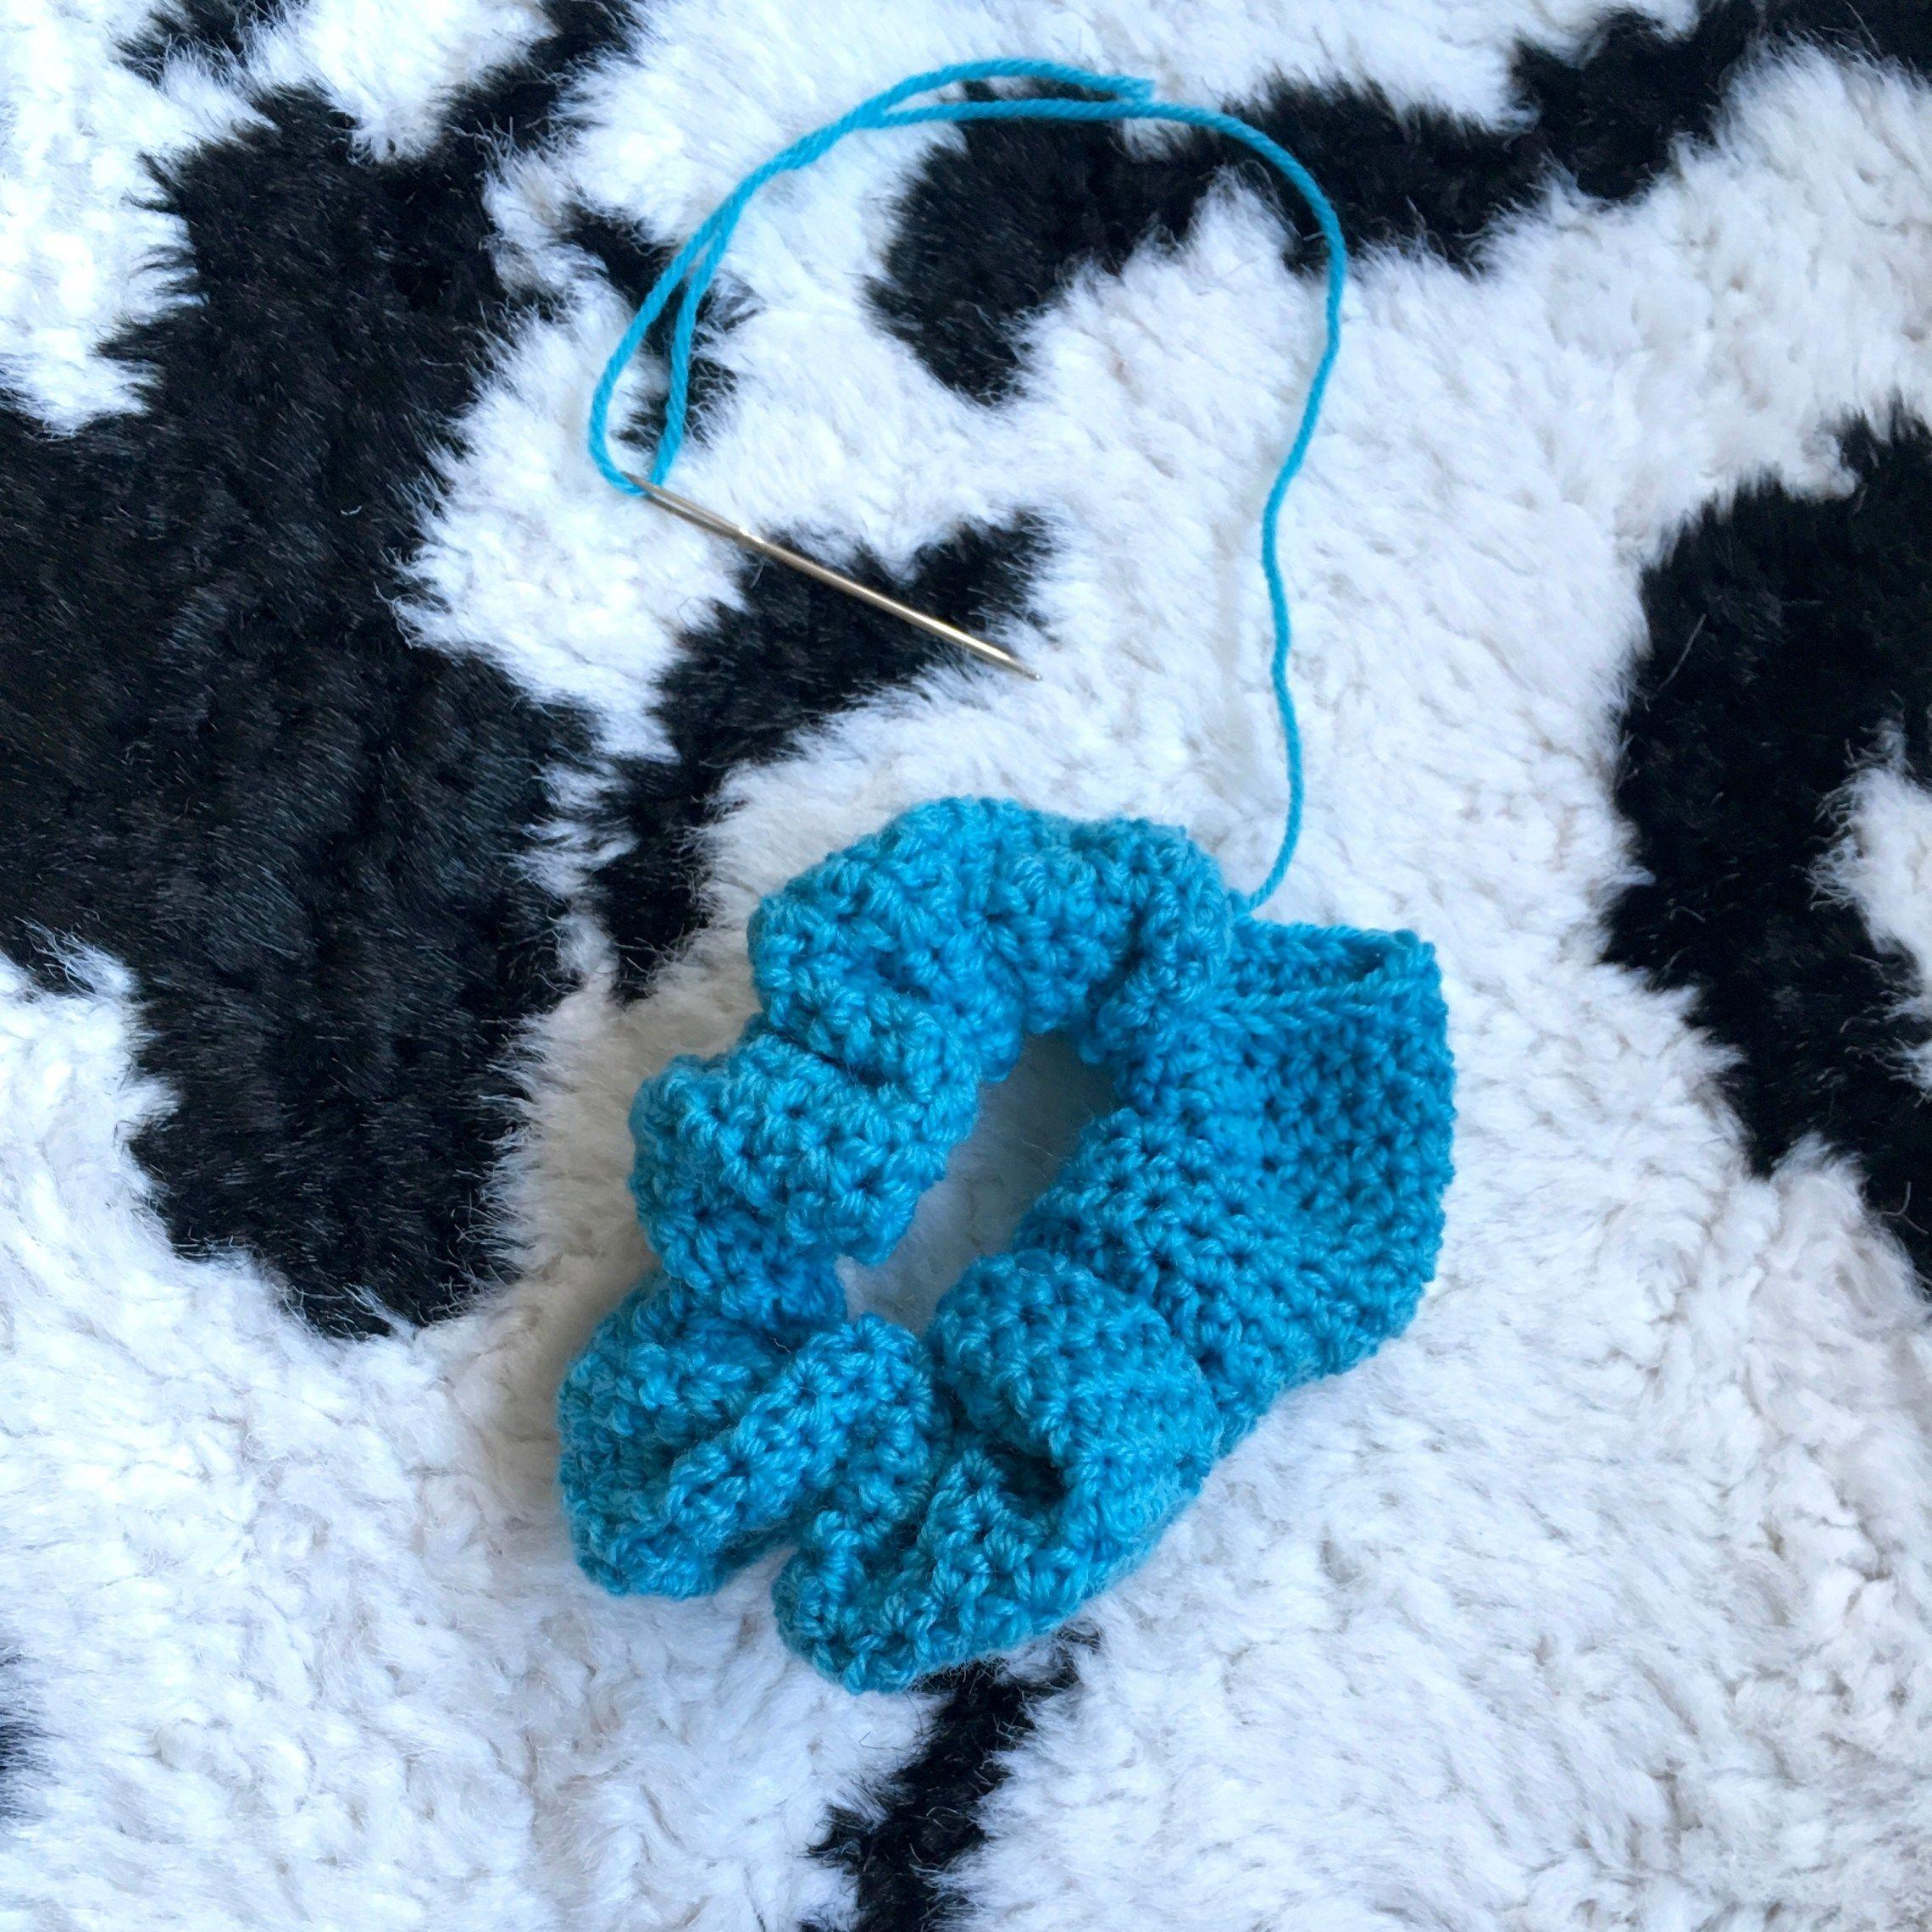 Thank Scrunchie it's Friday! - Free crochet Scrunchie Pattern #crochetscrunchies Thank Scrunchie it's Friday! - Free crochet Scrunchie Pattern - Dora Does #crochetscrunchies